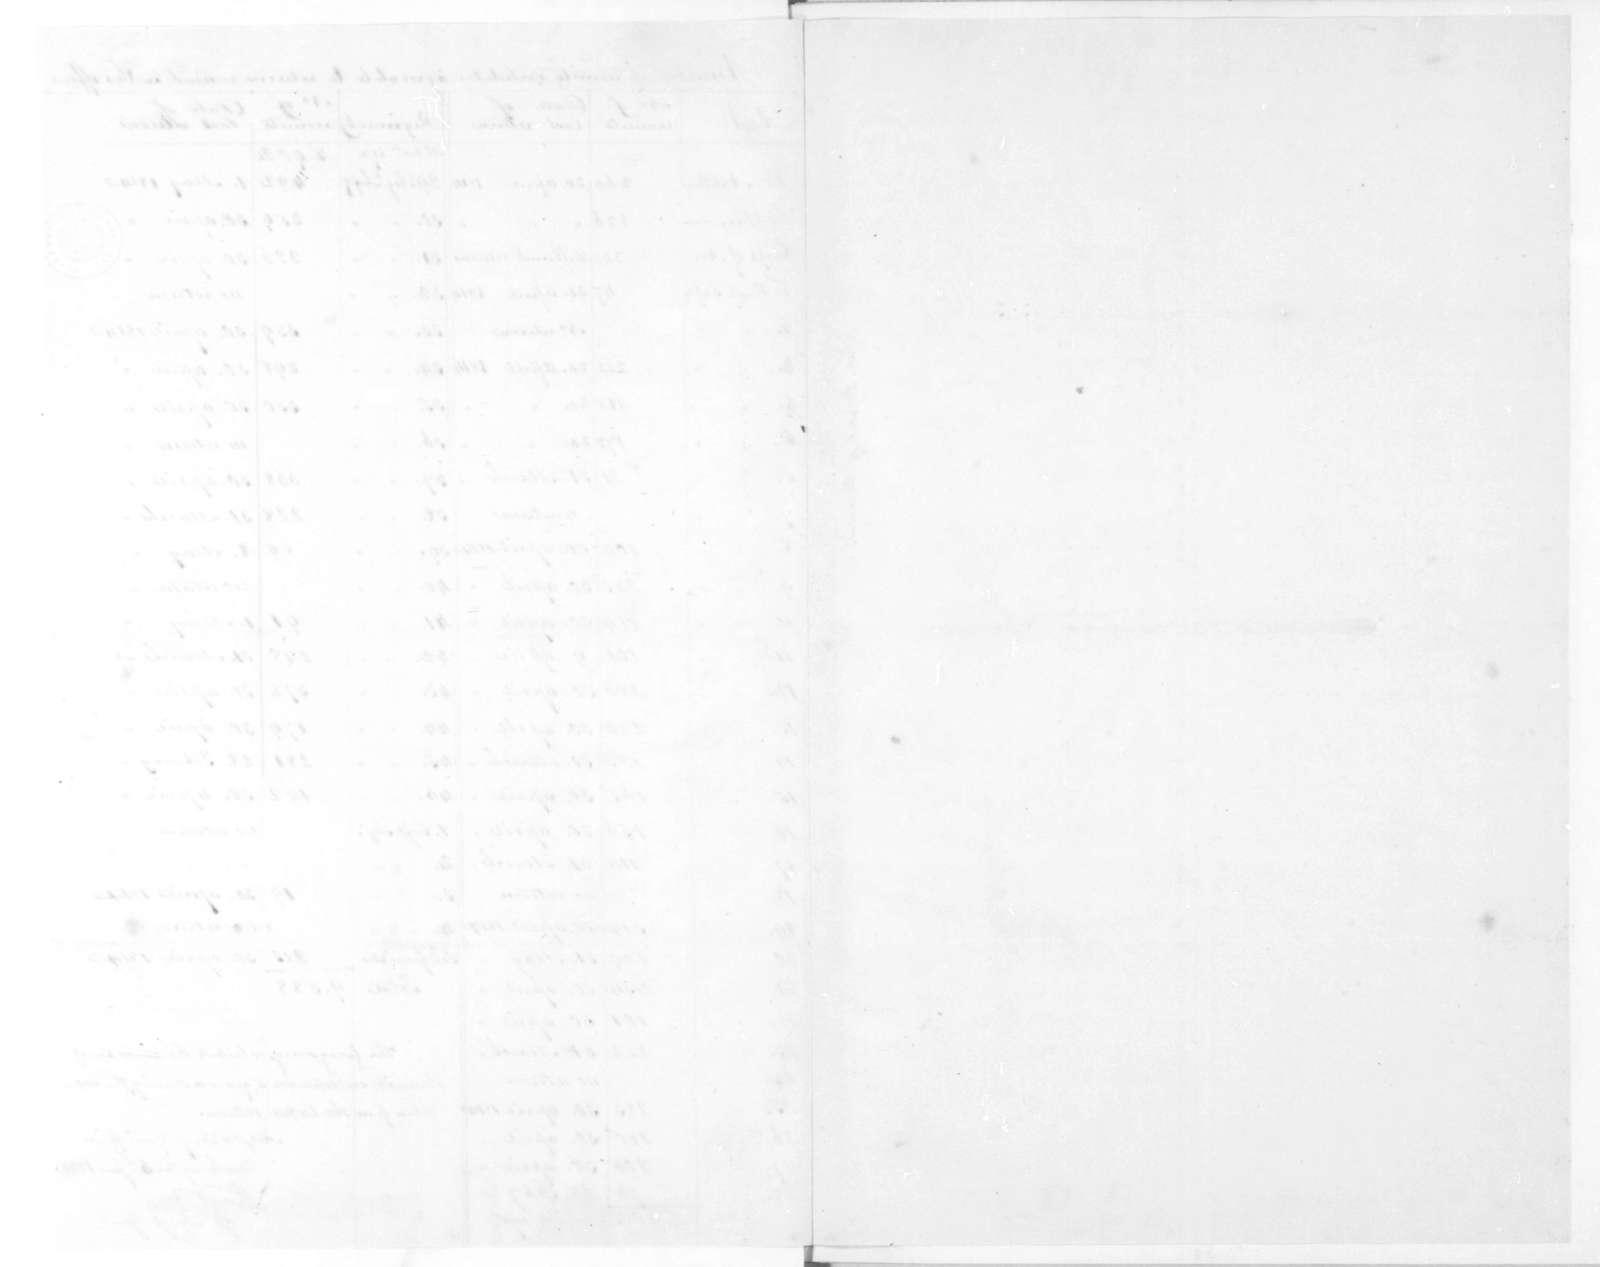 J. Bell, June 4, 1814. General report of recruits.